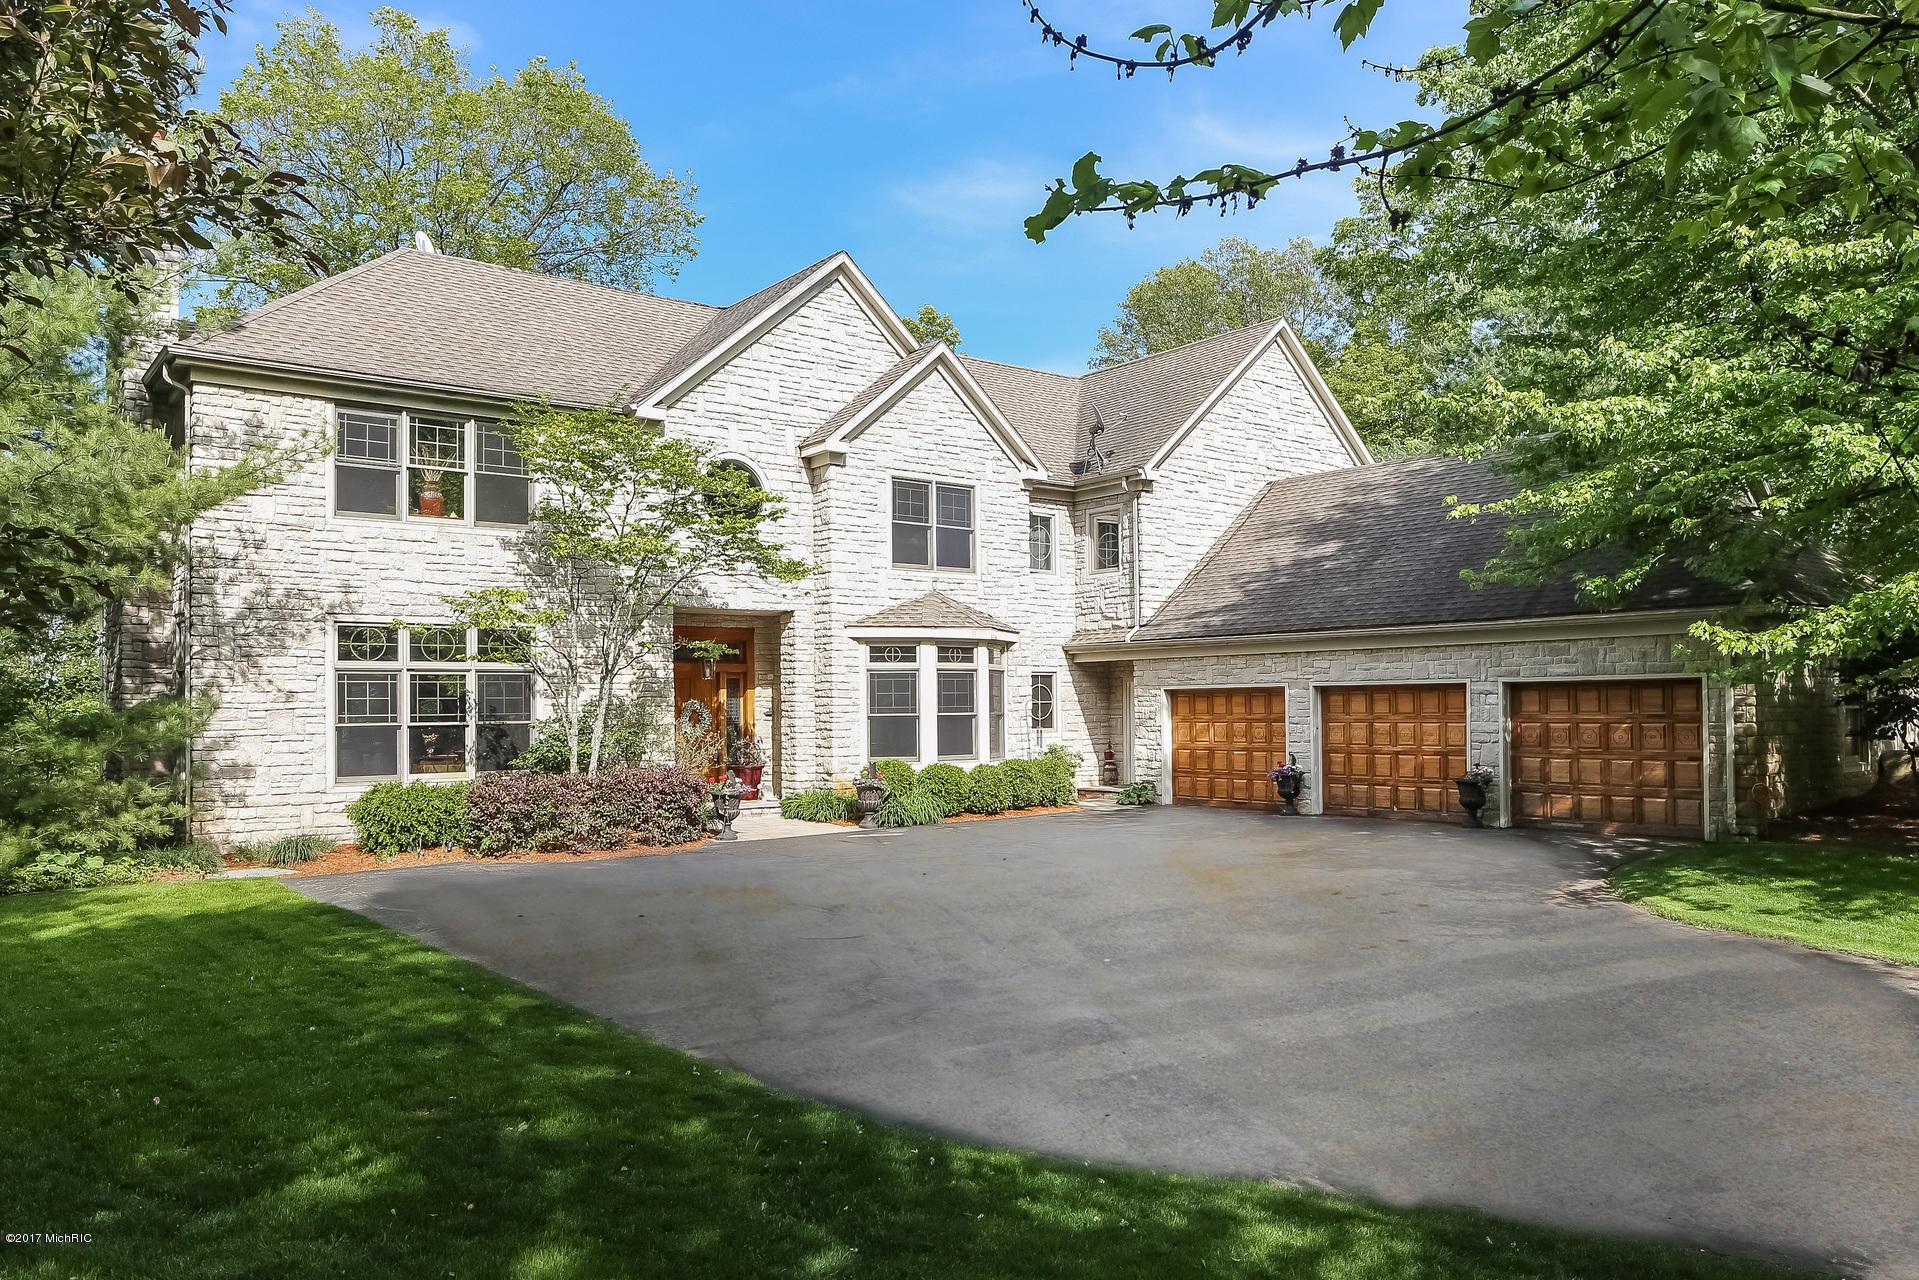 Single Family Home for Sale at 5069 Mountain Ridge Ada, Michigan 49301 United States